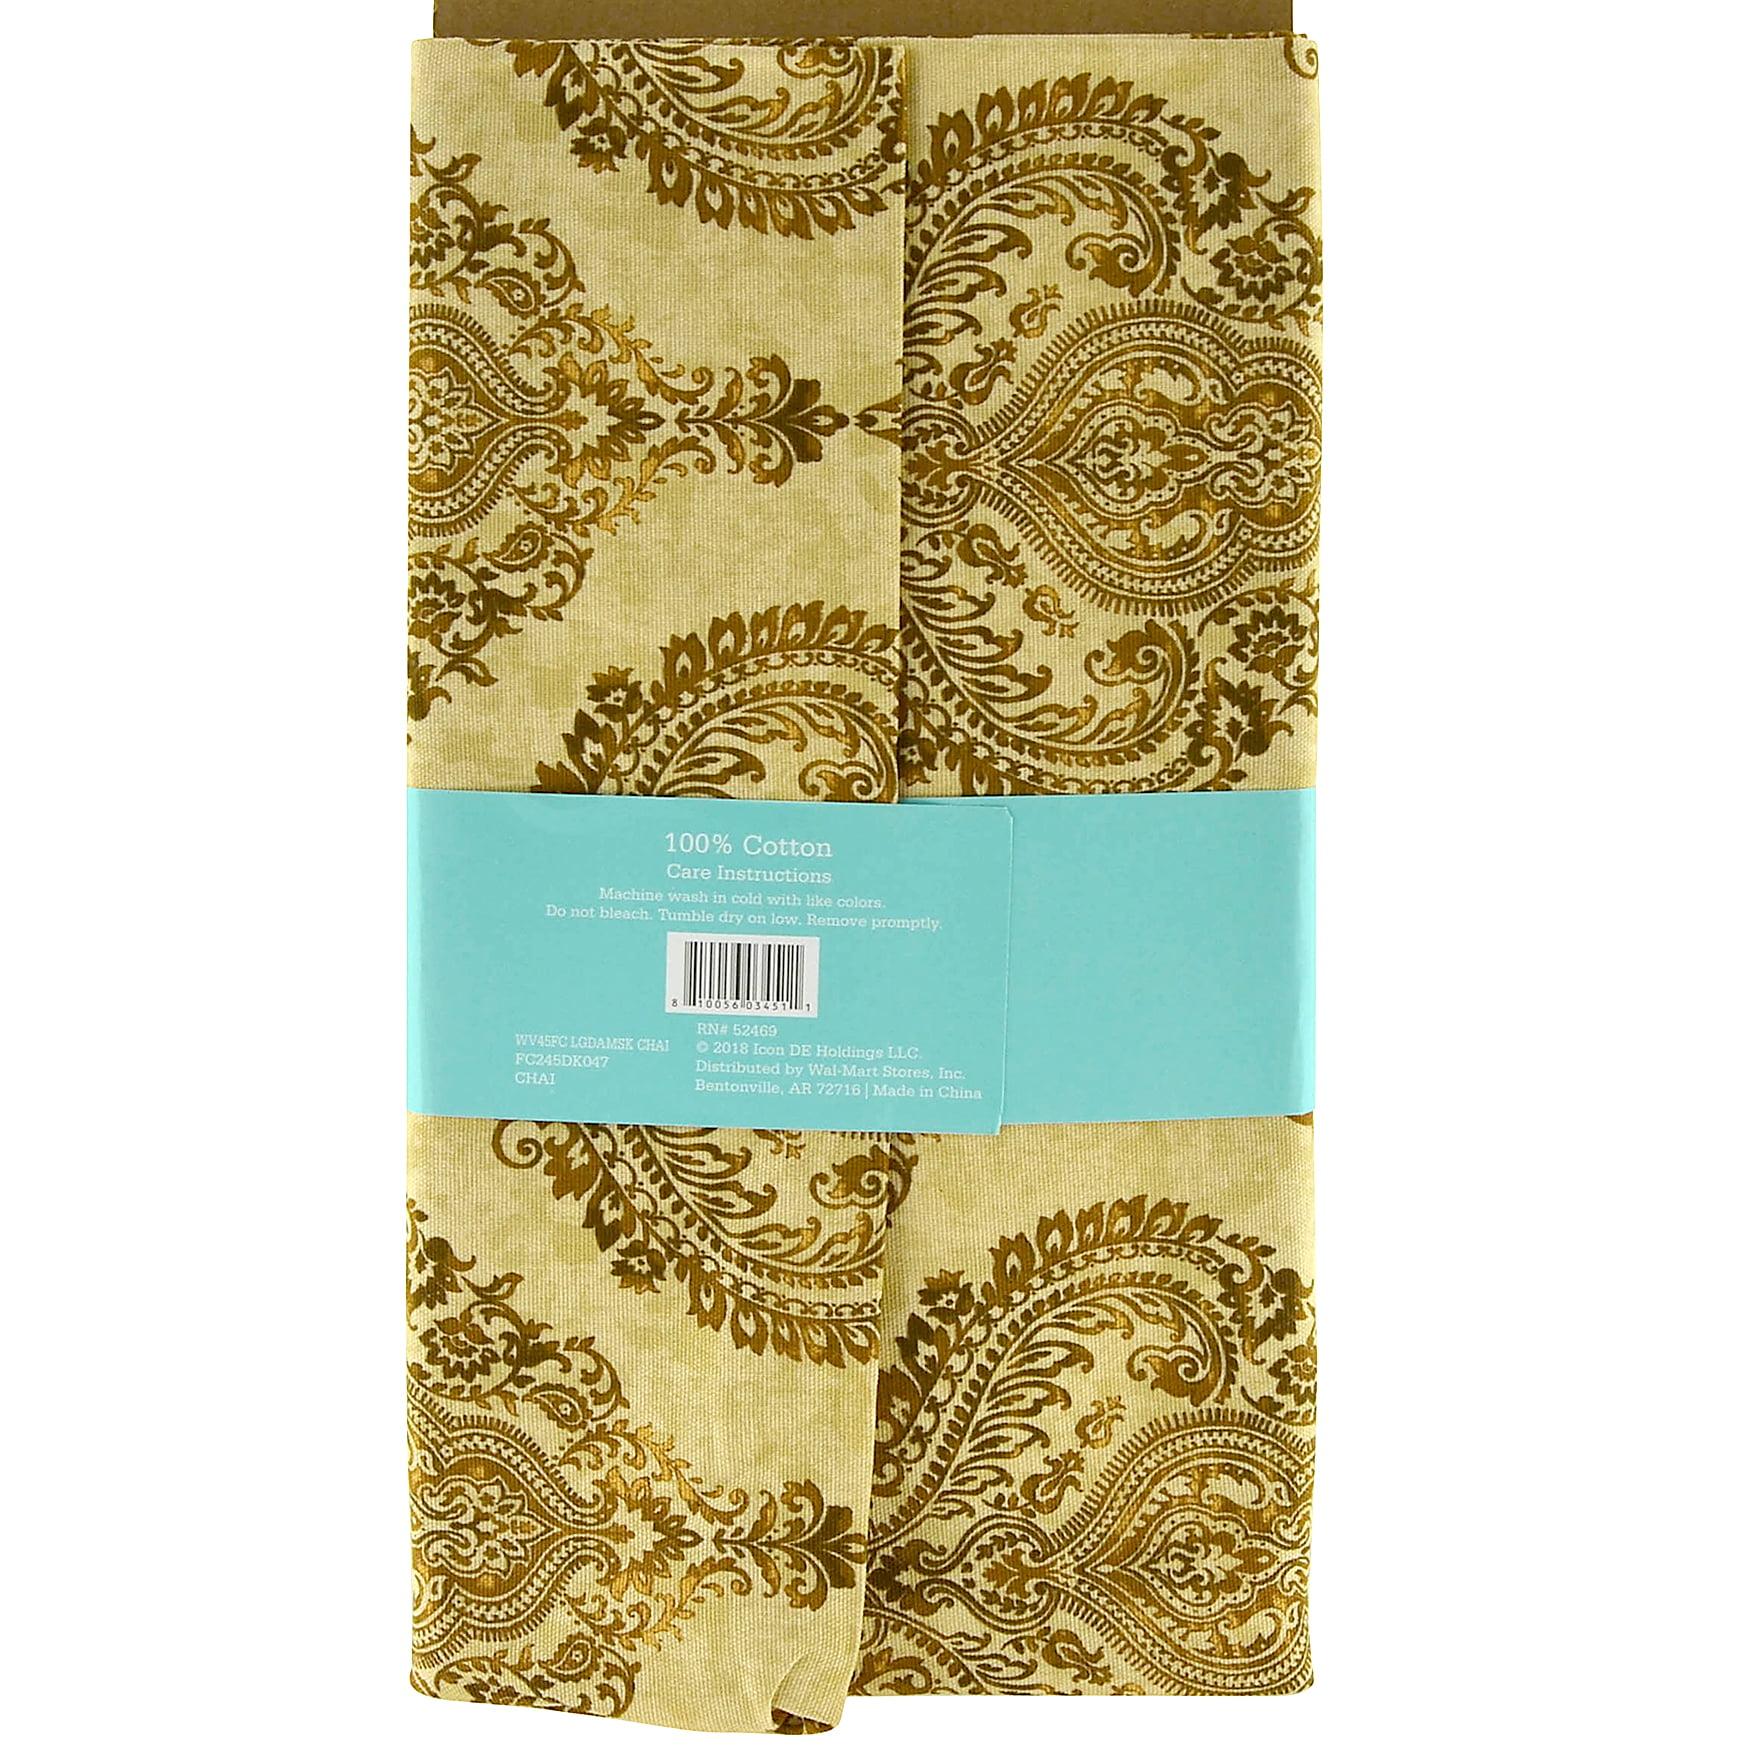 Waverly Inspirations 100% Cotton Duck Fabric, 2 Yards, Chai